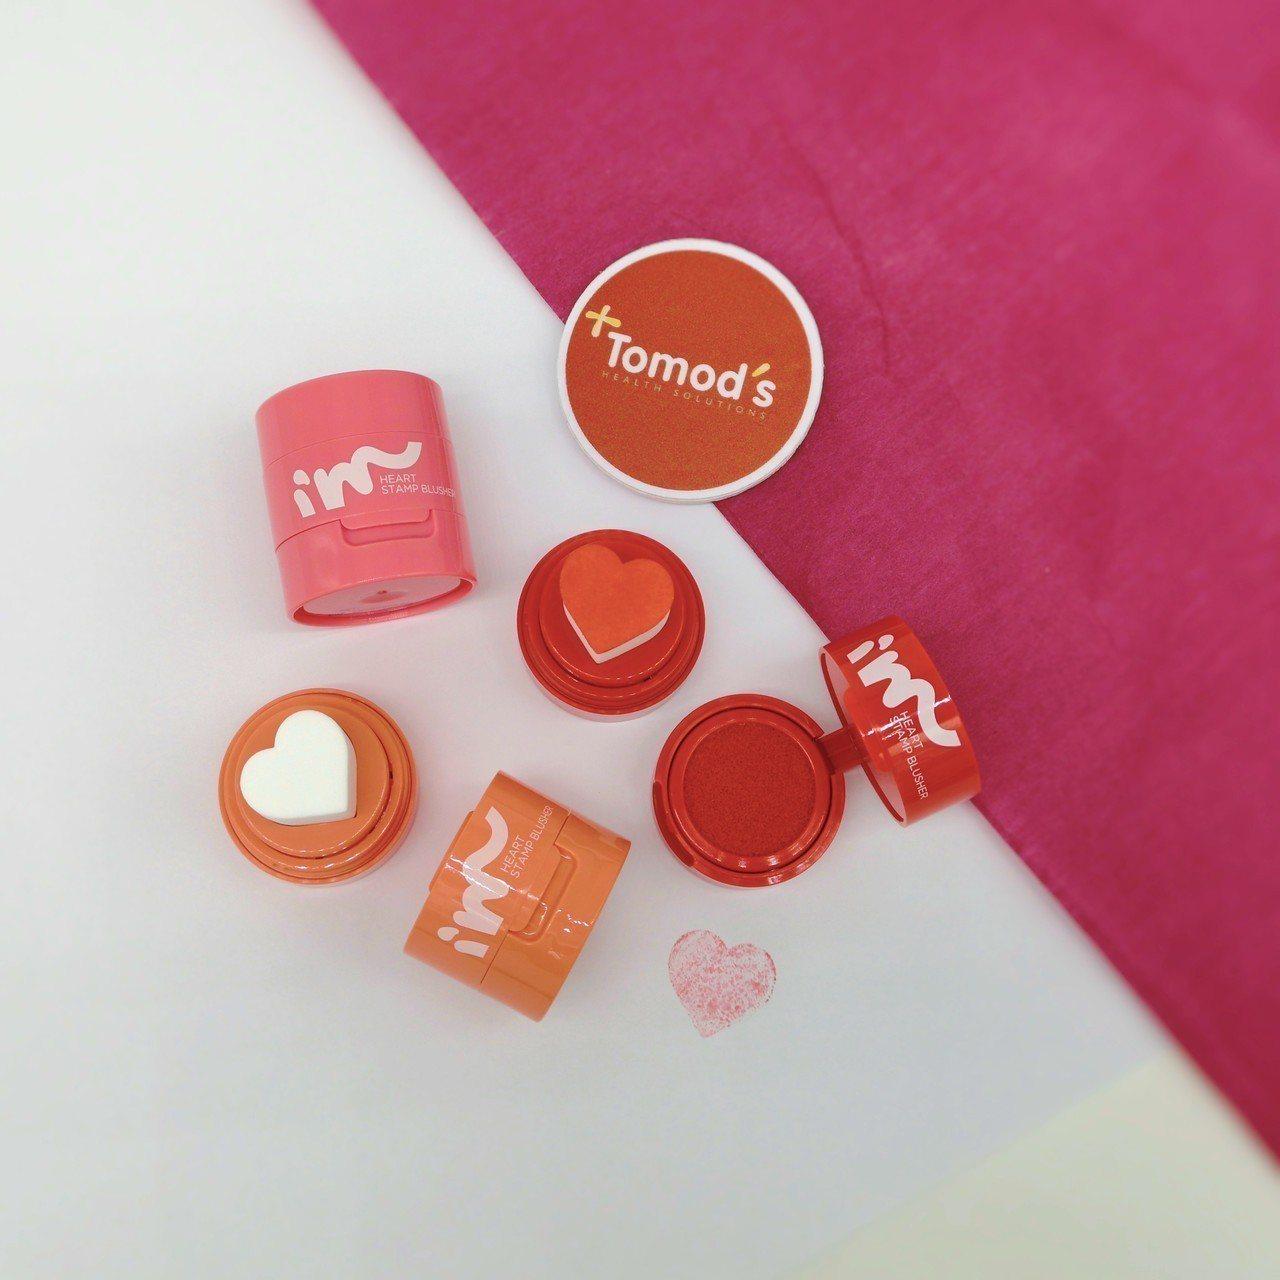 Tomod's推出1111特別企畫,多項脫單必備美妝品優惠,I'MEME我愛氣墊...